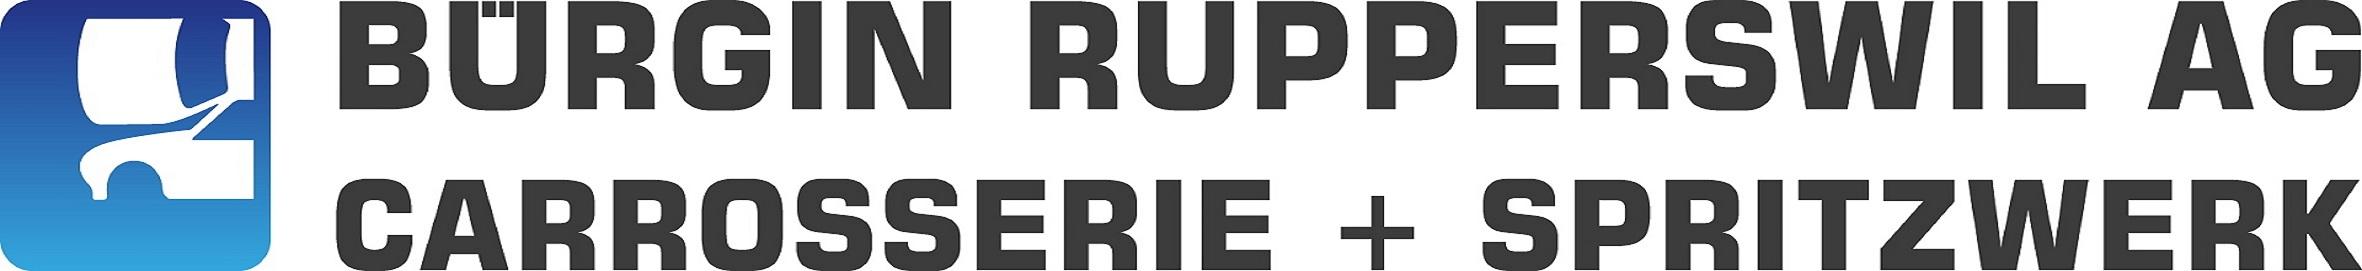 Logo Bürgin Rupperswil AG